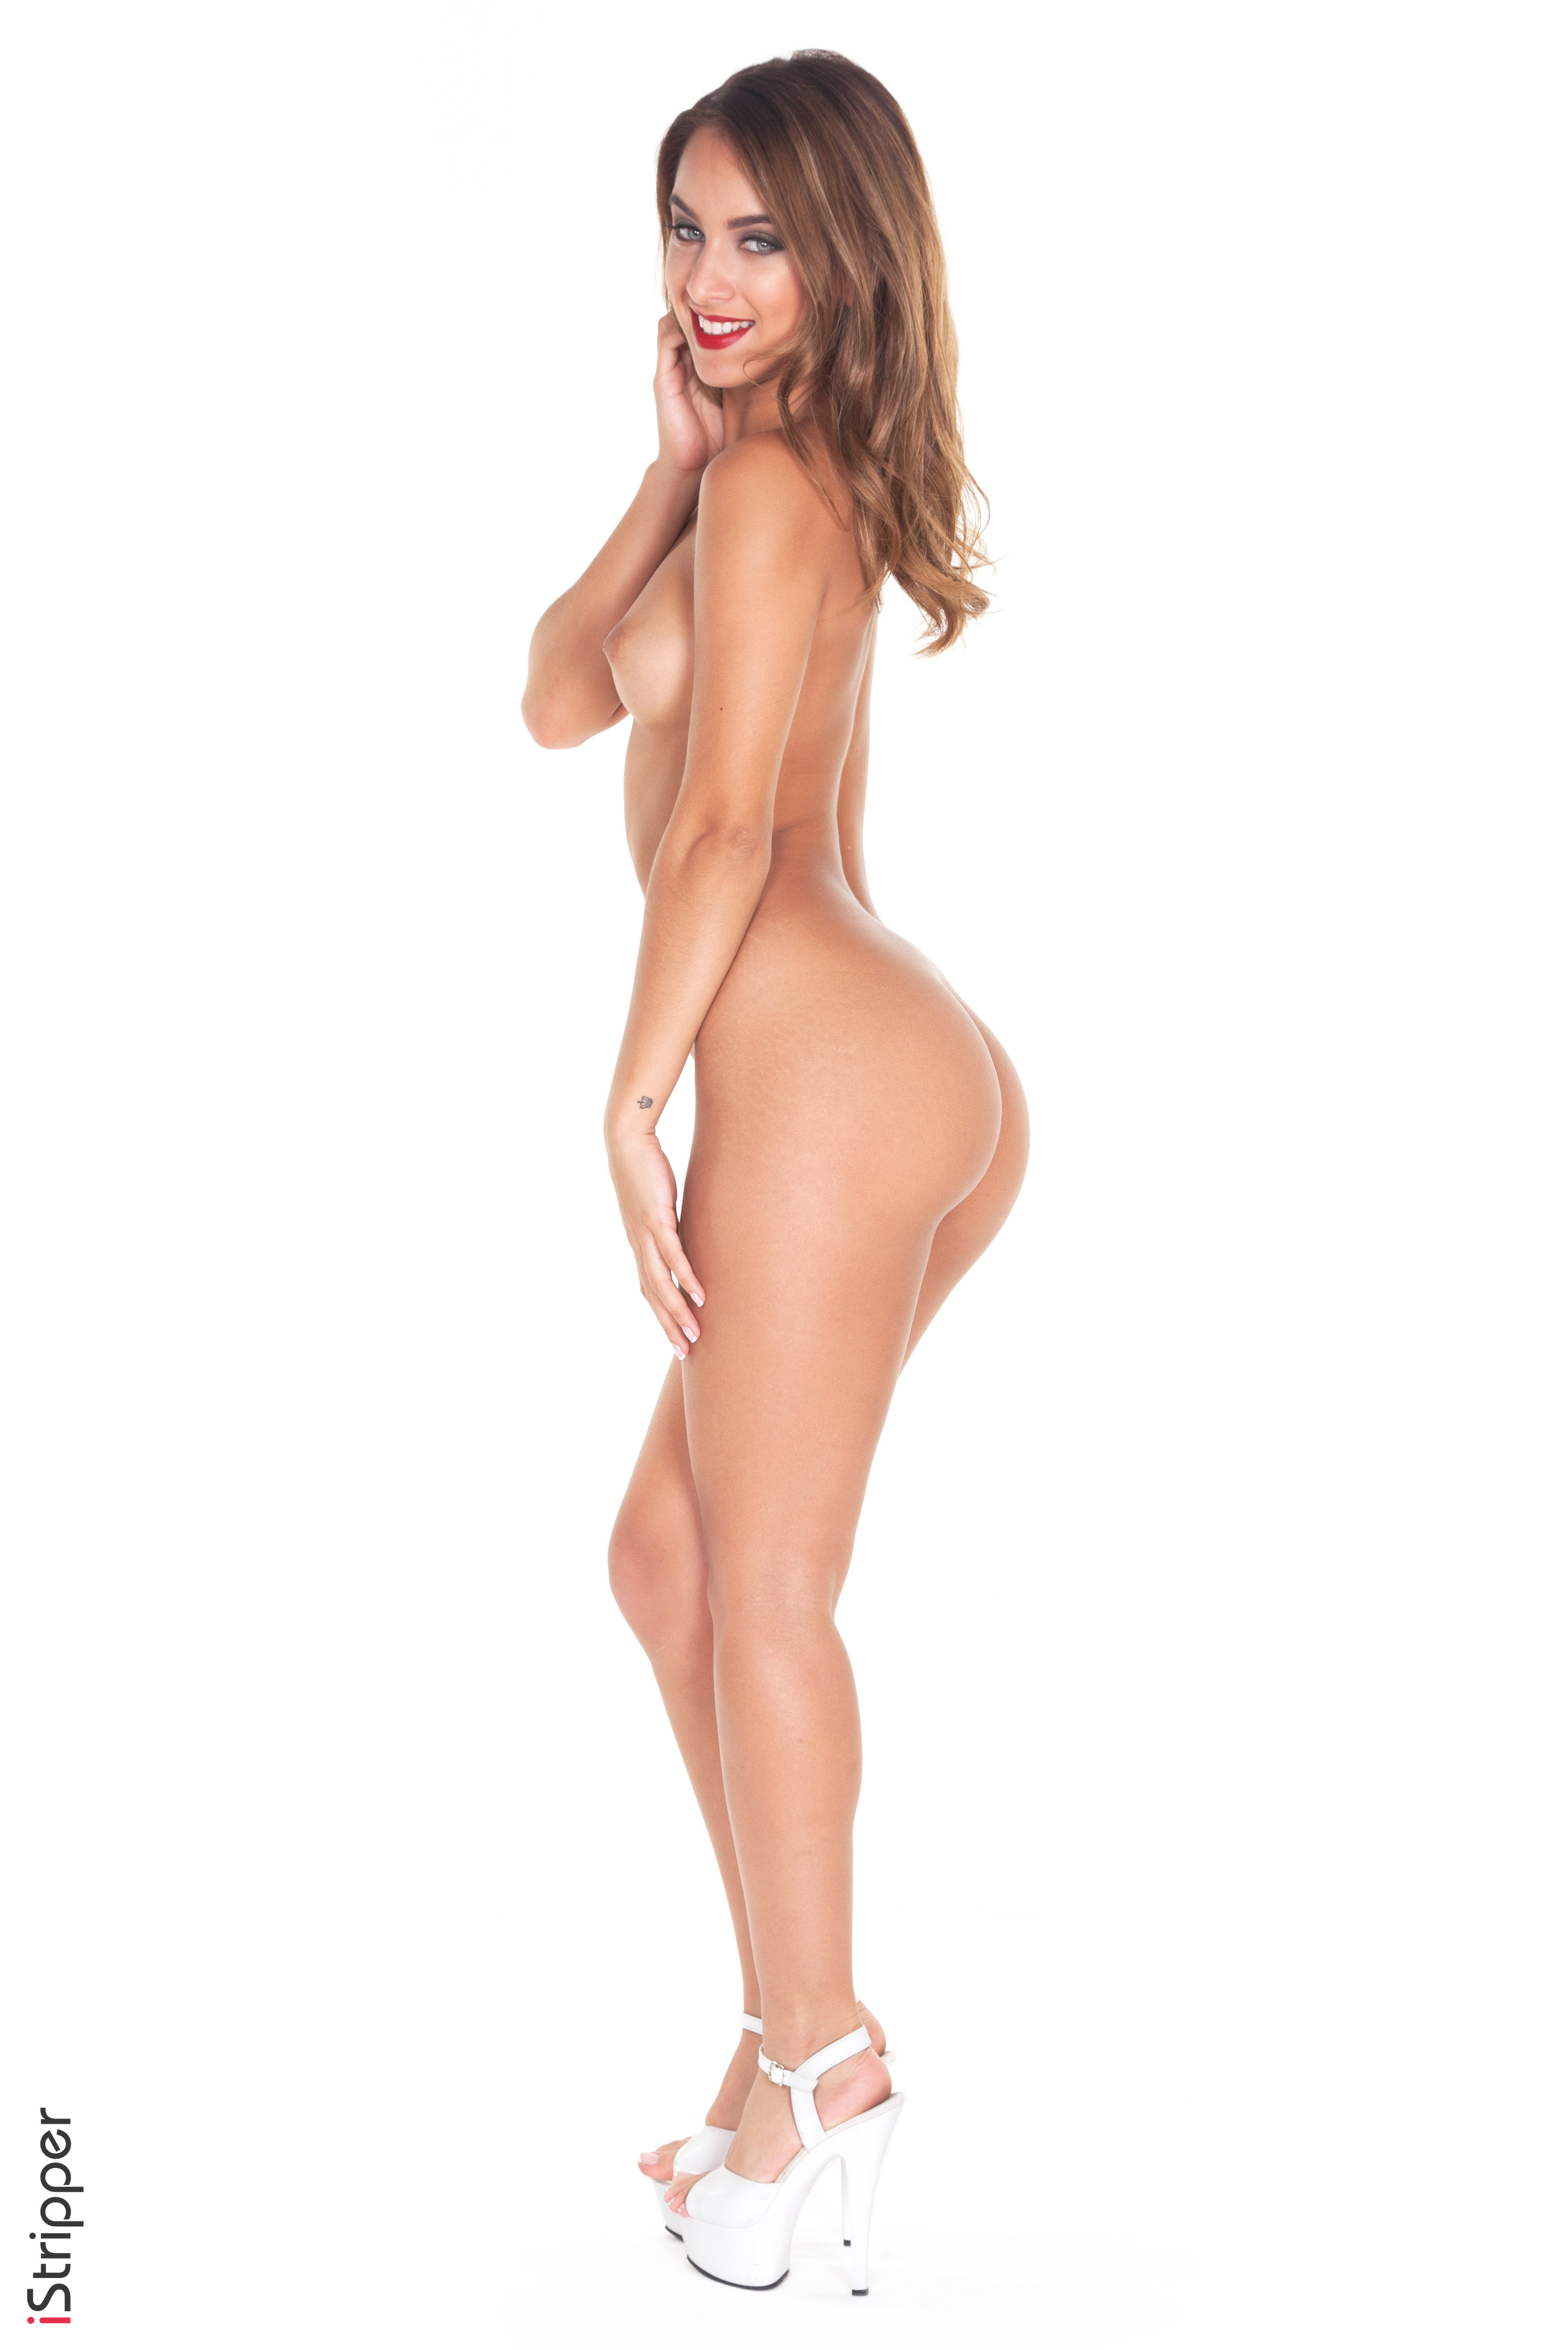 hot sexy girls stripping